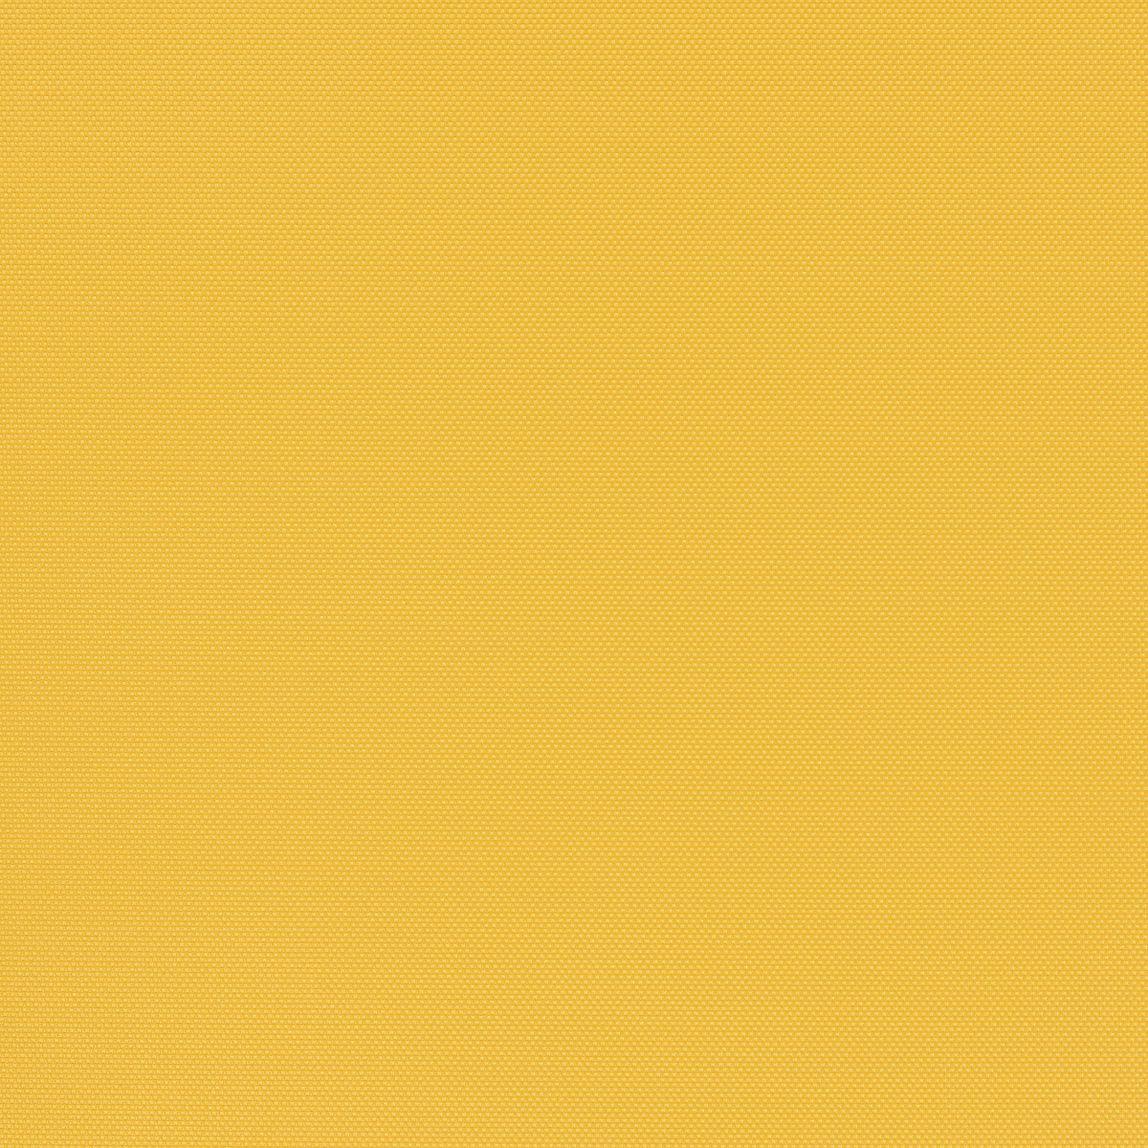 Amplify Marigold Swatch